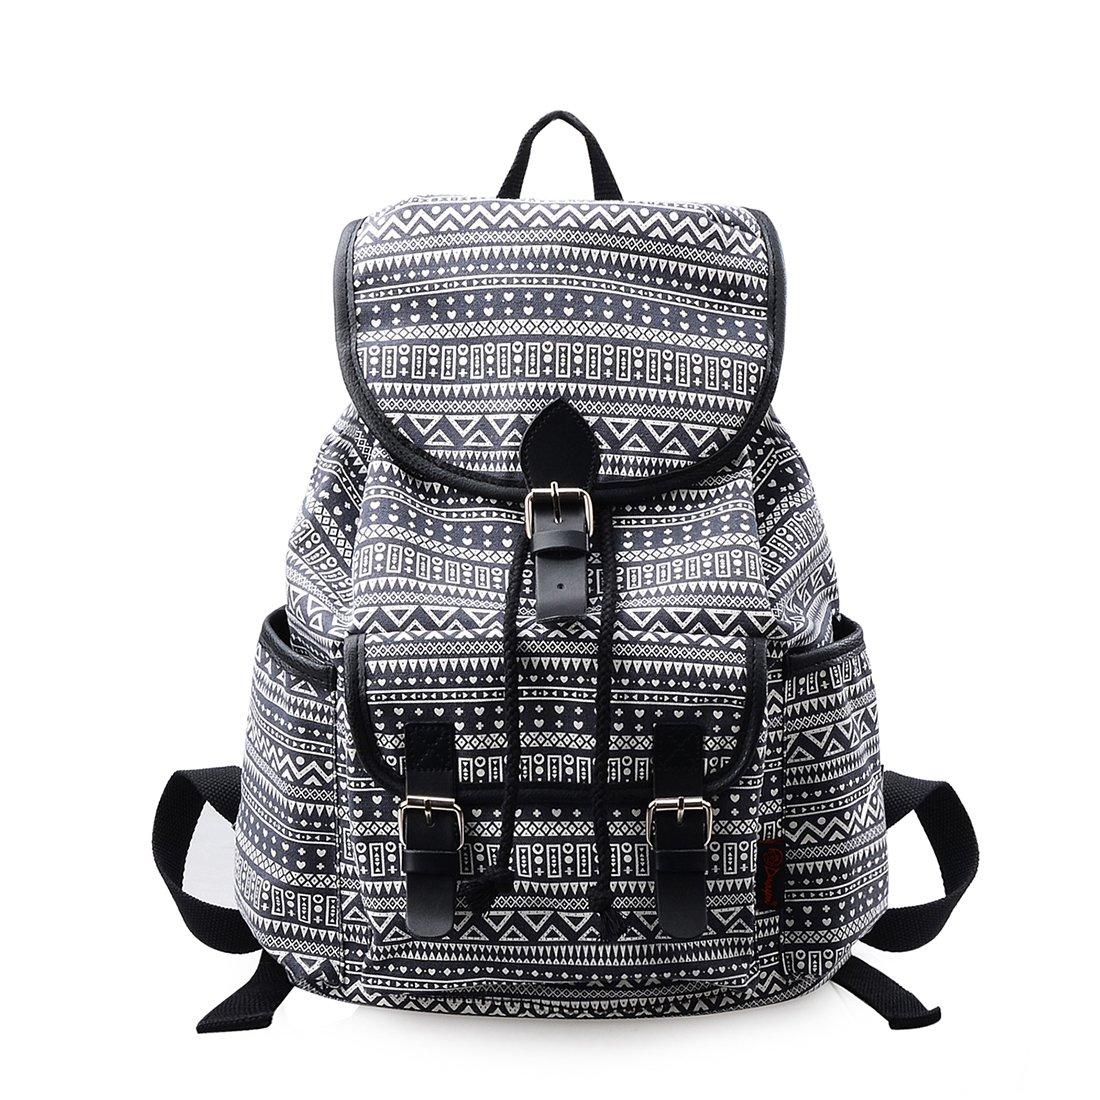 Lt Tribe Womens Canvas Backpack Shoulder Bag Travel College Daypack Black Geometry G00265